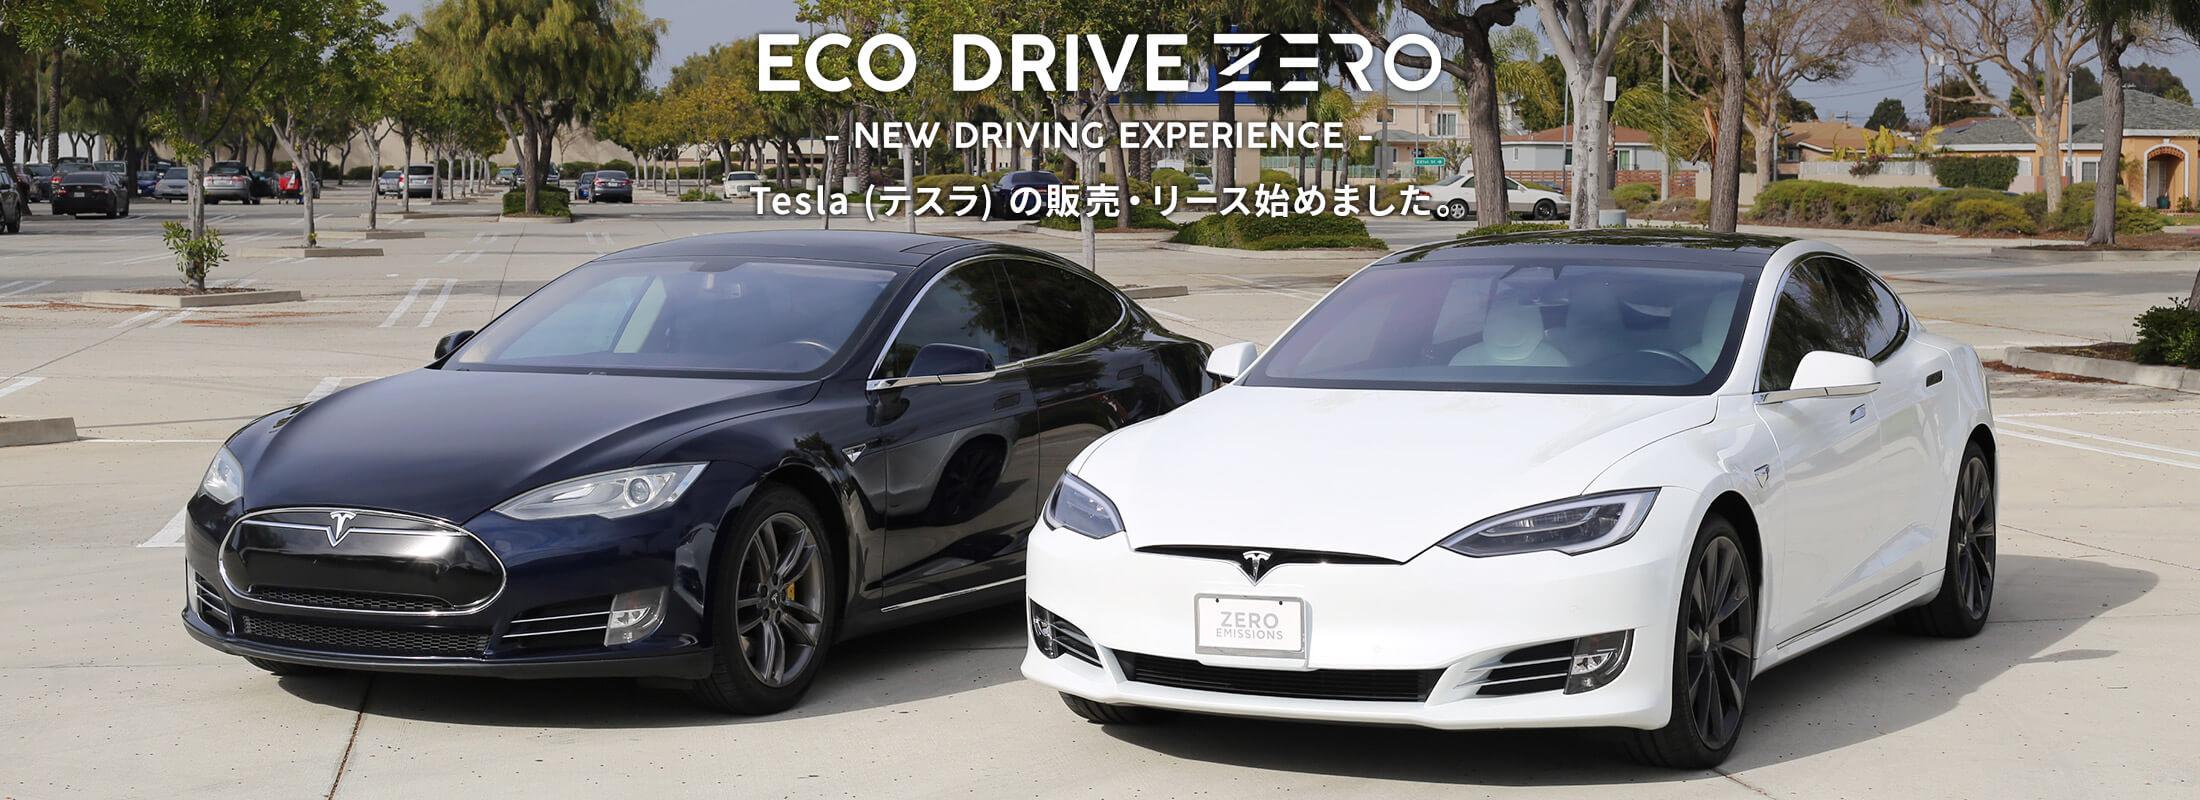 ECO DRIVE ZERO Tesla (テスラ) の販売・リース